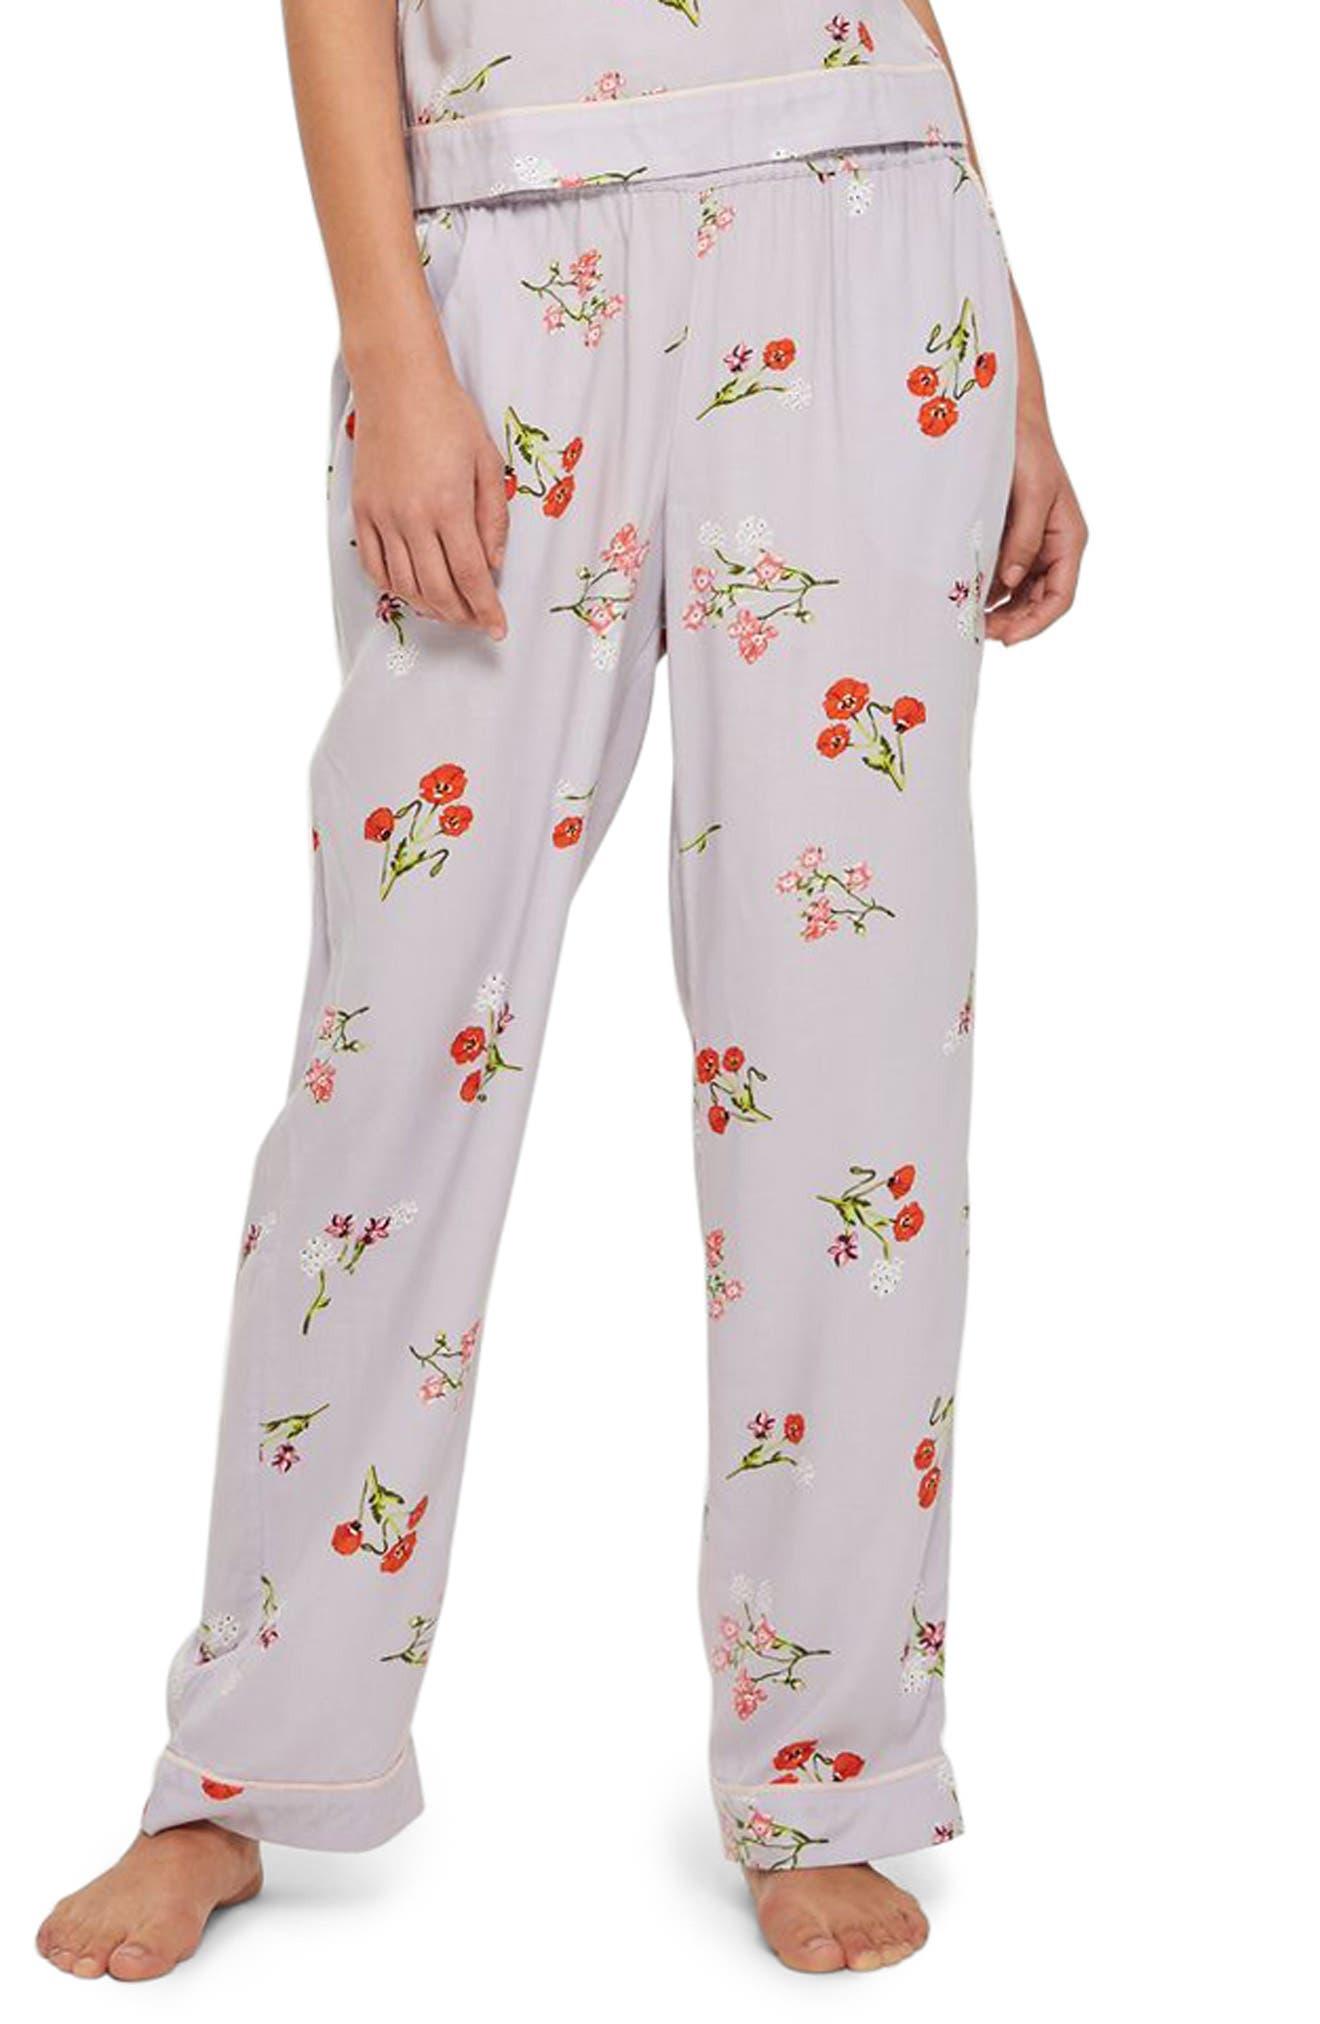 Poppy Print Pajama Pants,                             Main thumbnail 1, color,                             450